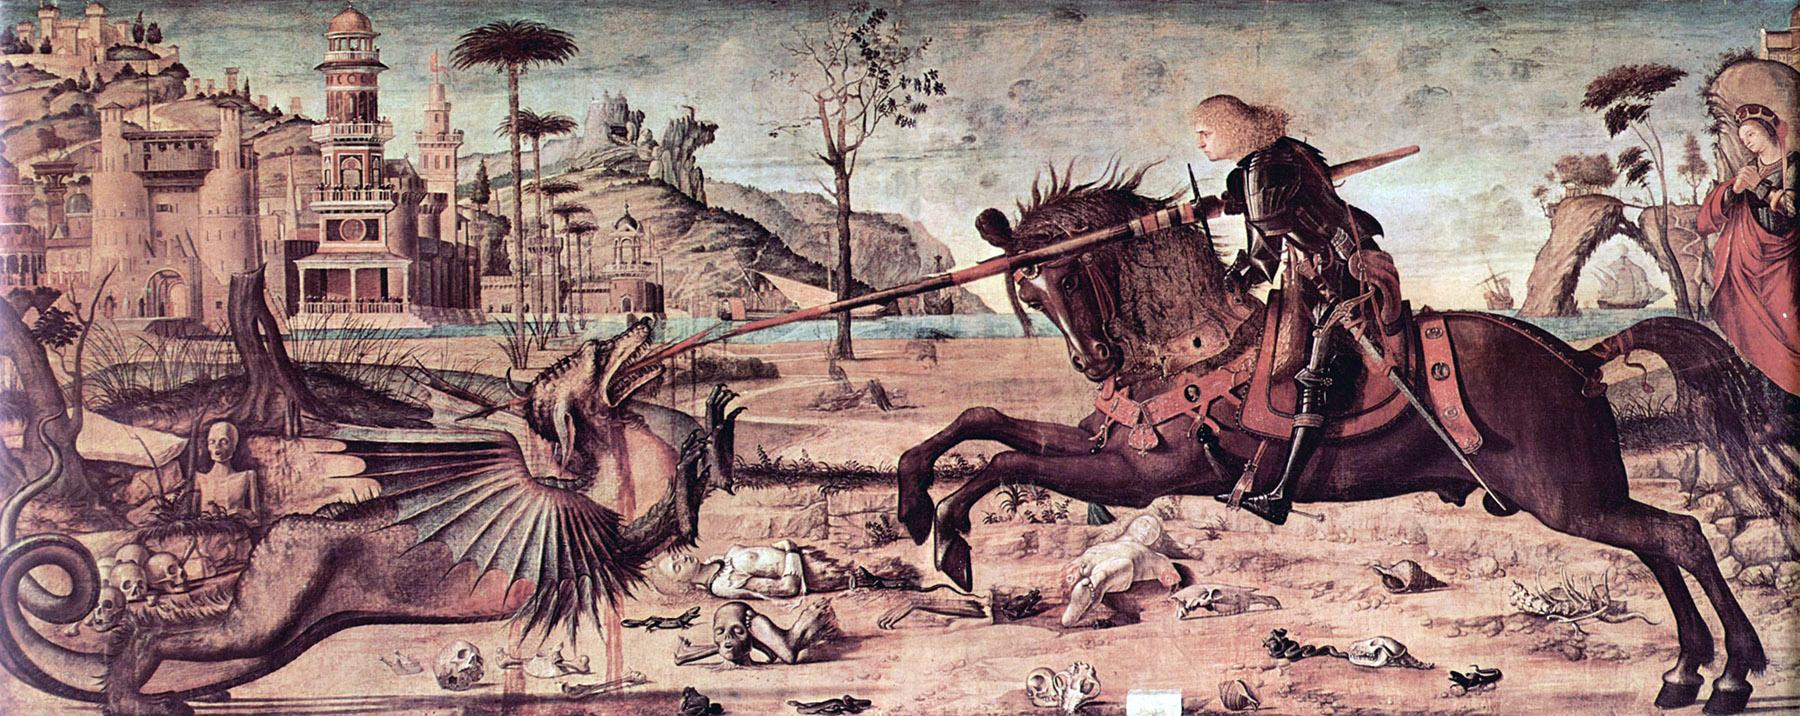 Venetian Gothic Architecture - The World of Carpaccio